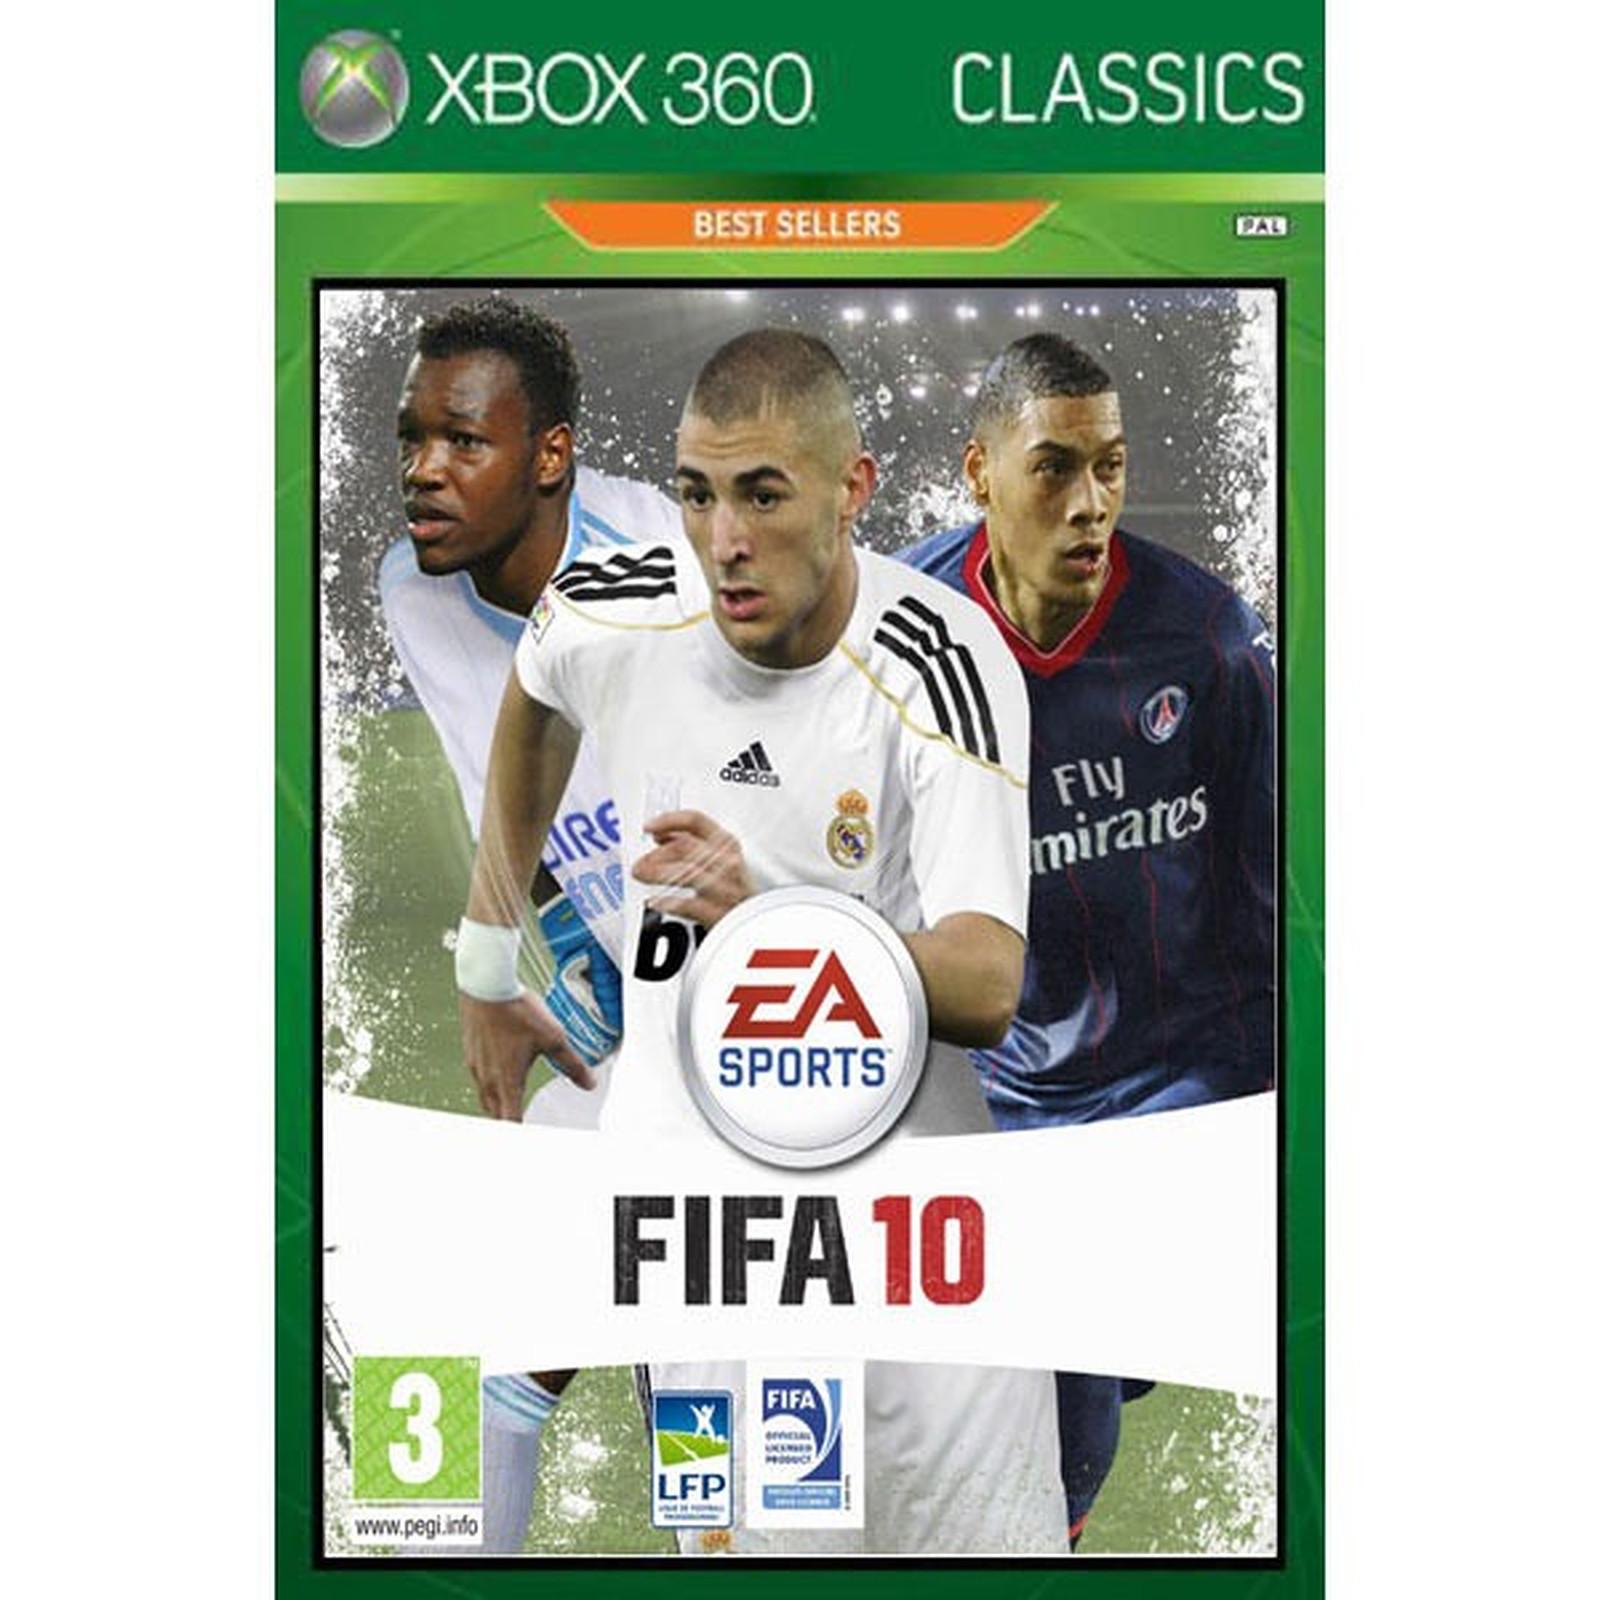 FIFA 10 Classics (Xbox 360)